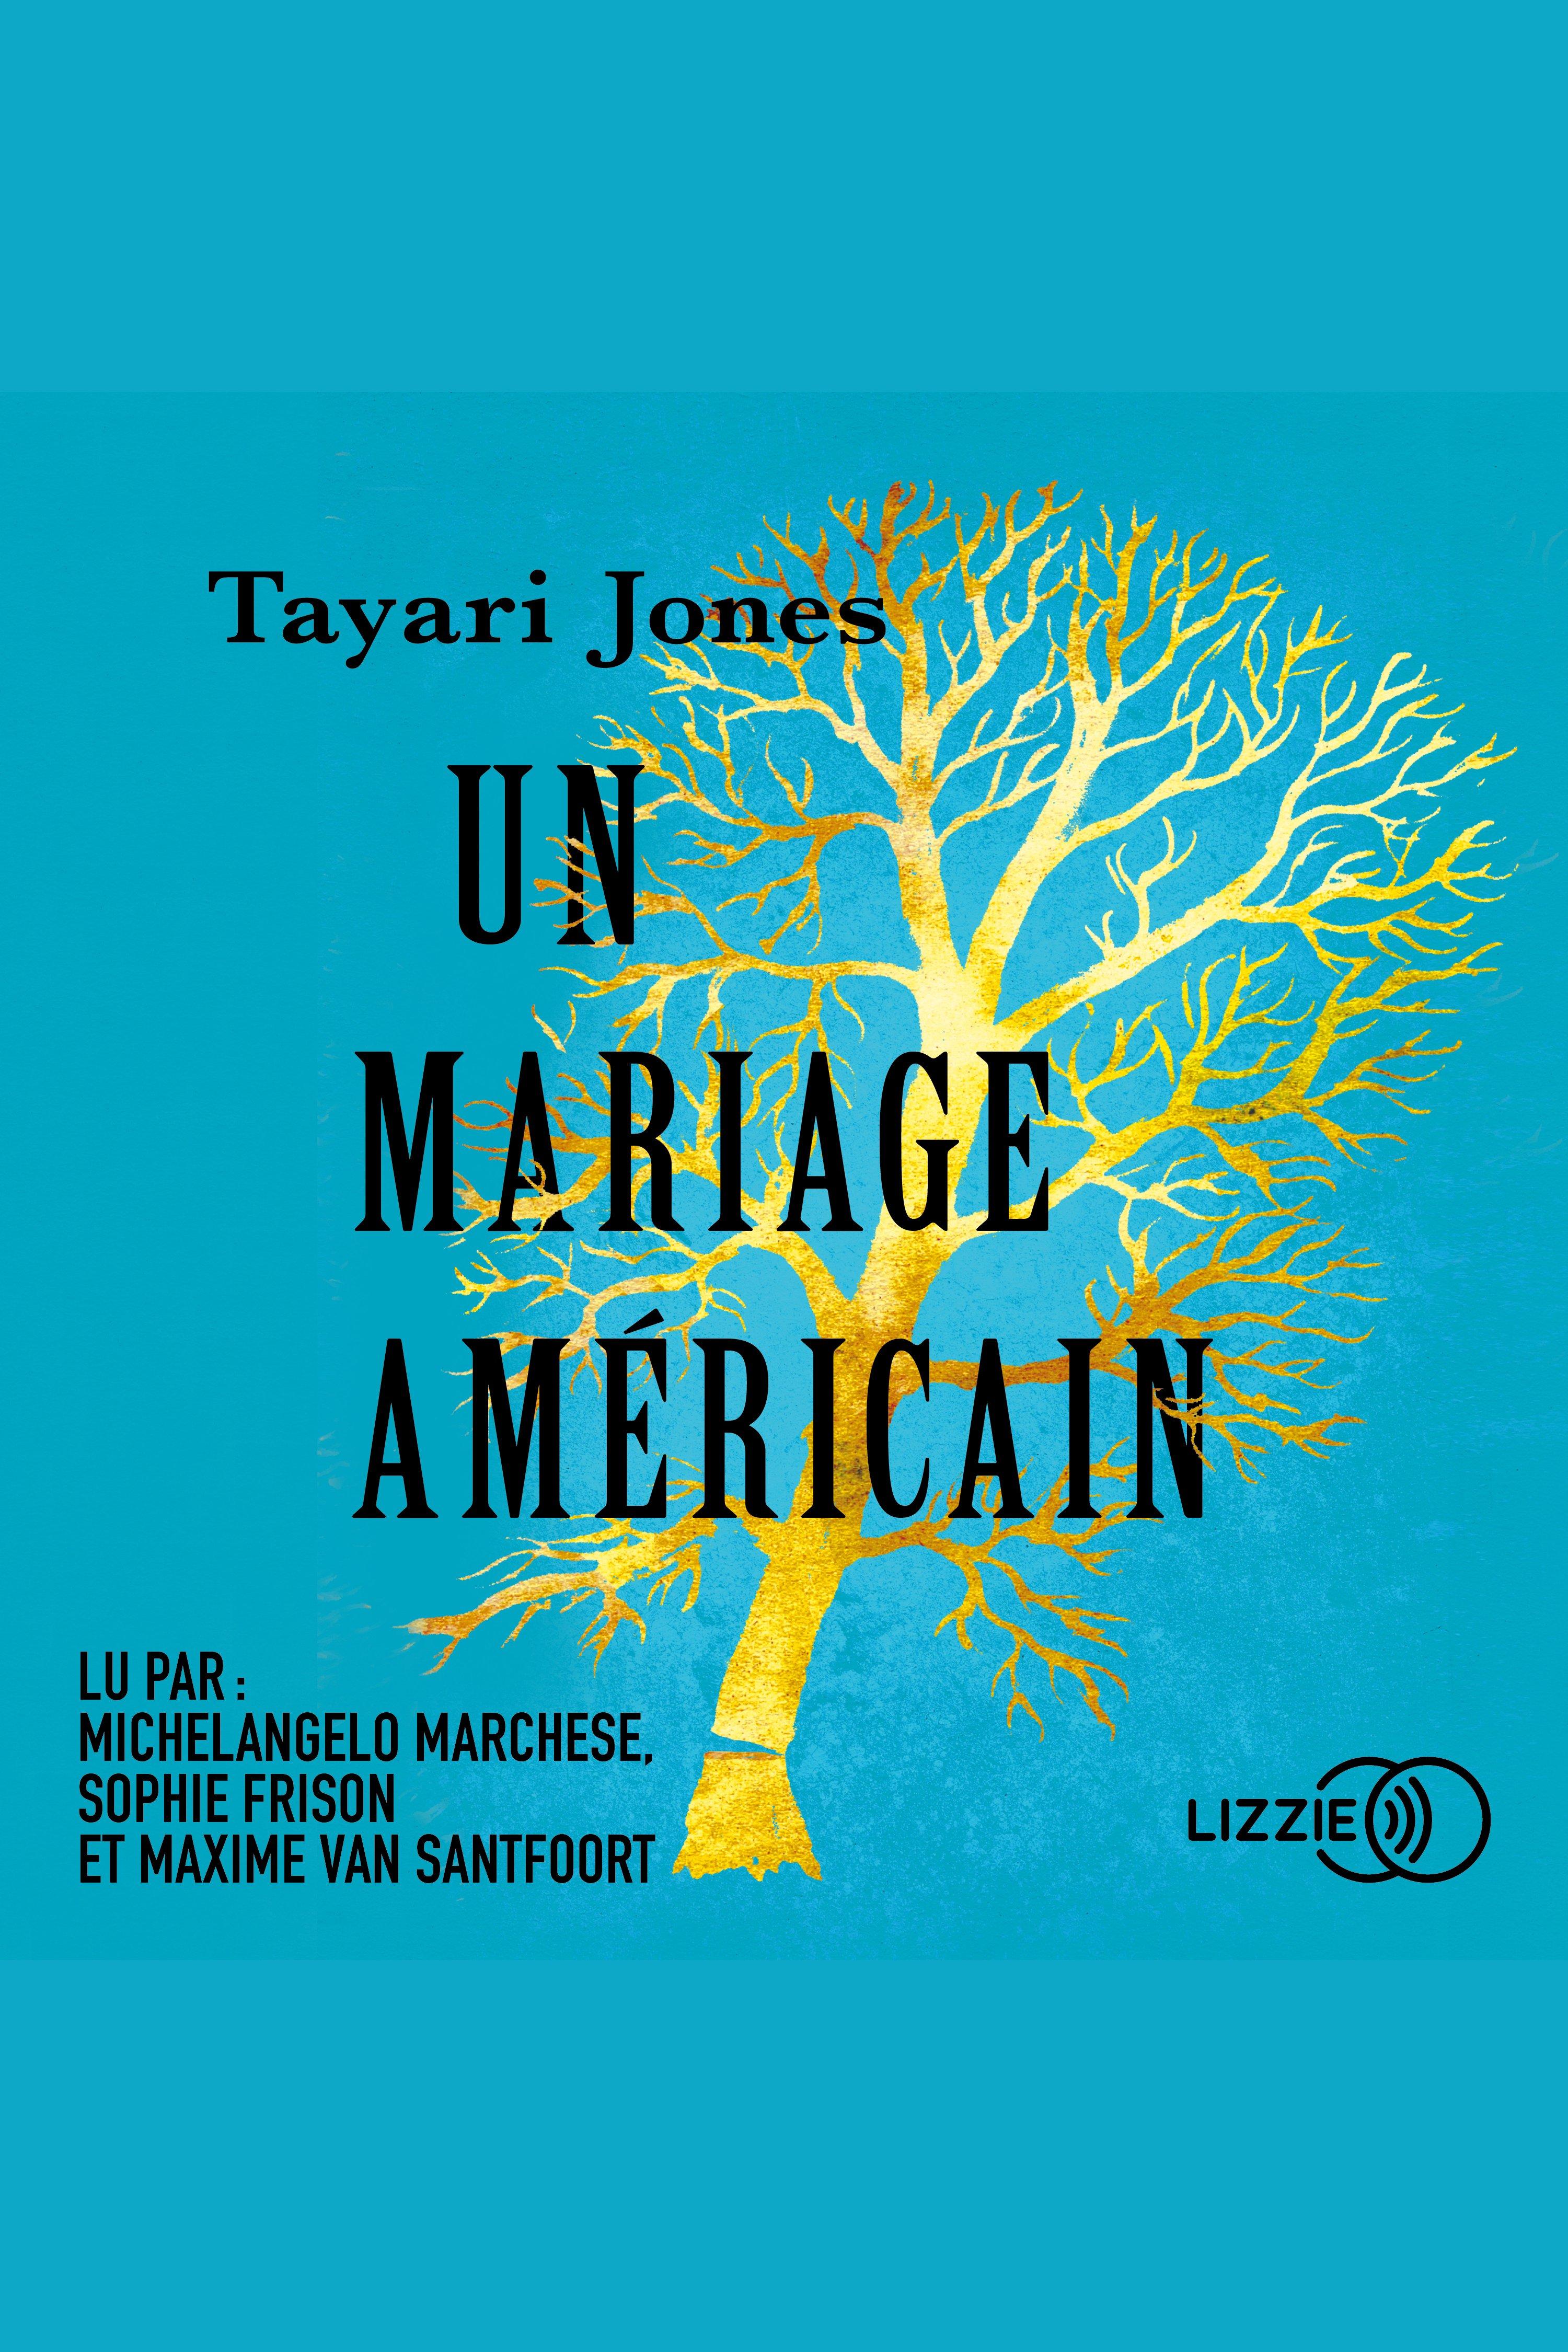 Image: Un mariage américain